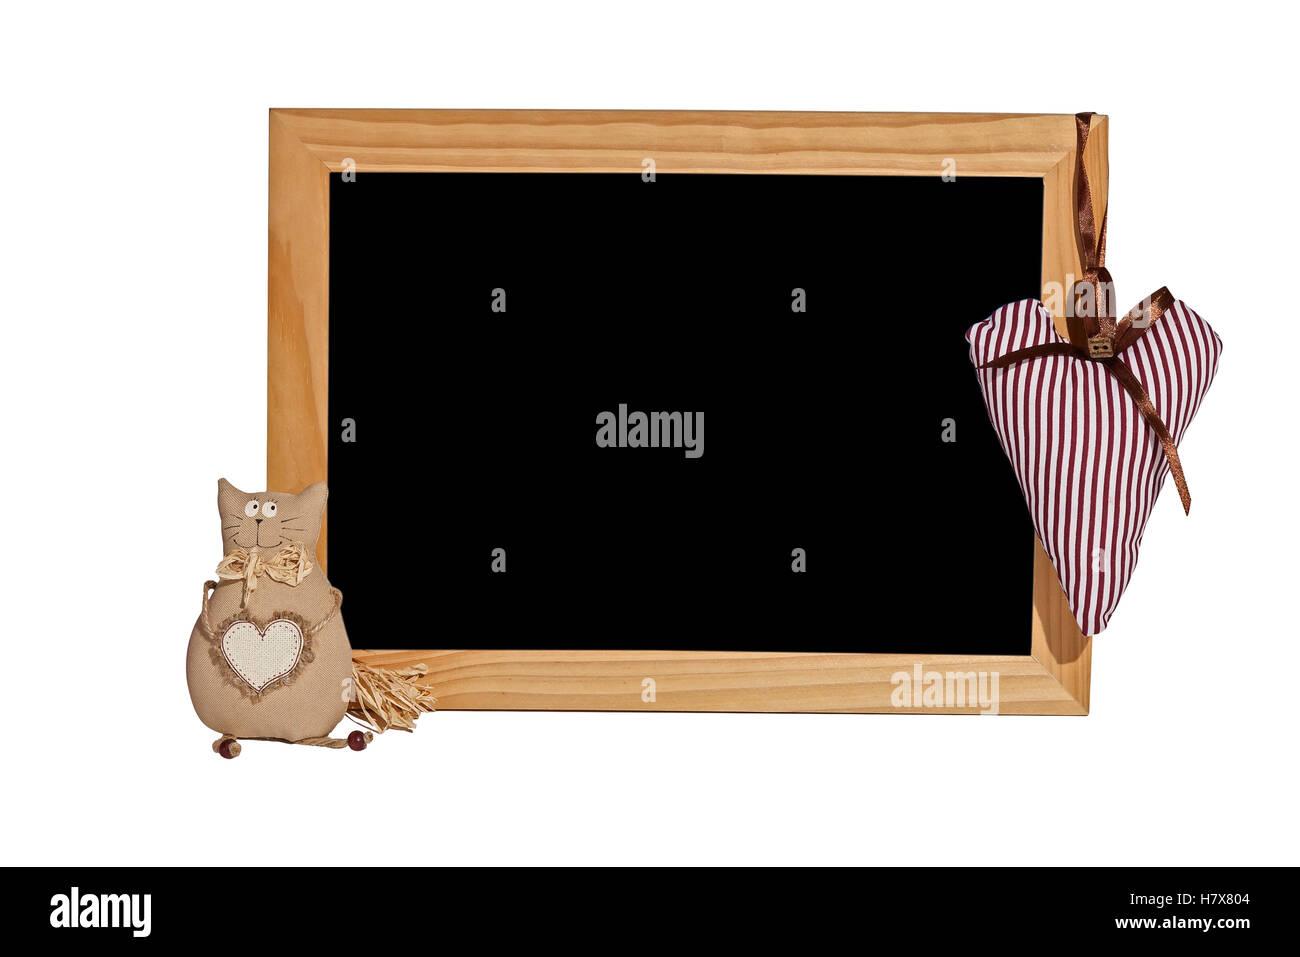 Toy Frame Stockfotos & Toy Frame Bilder - Alamy